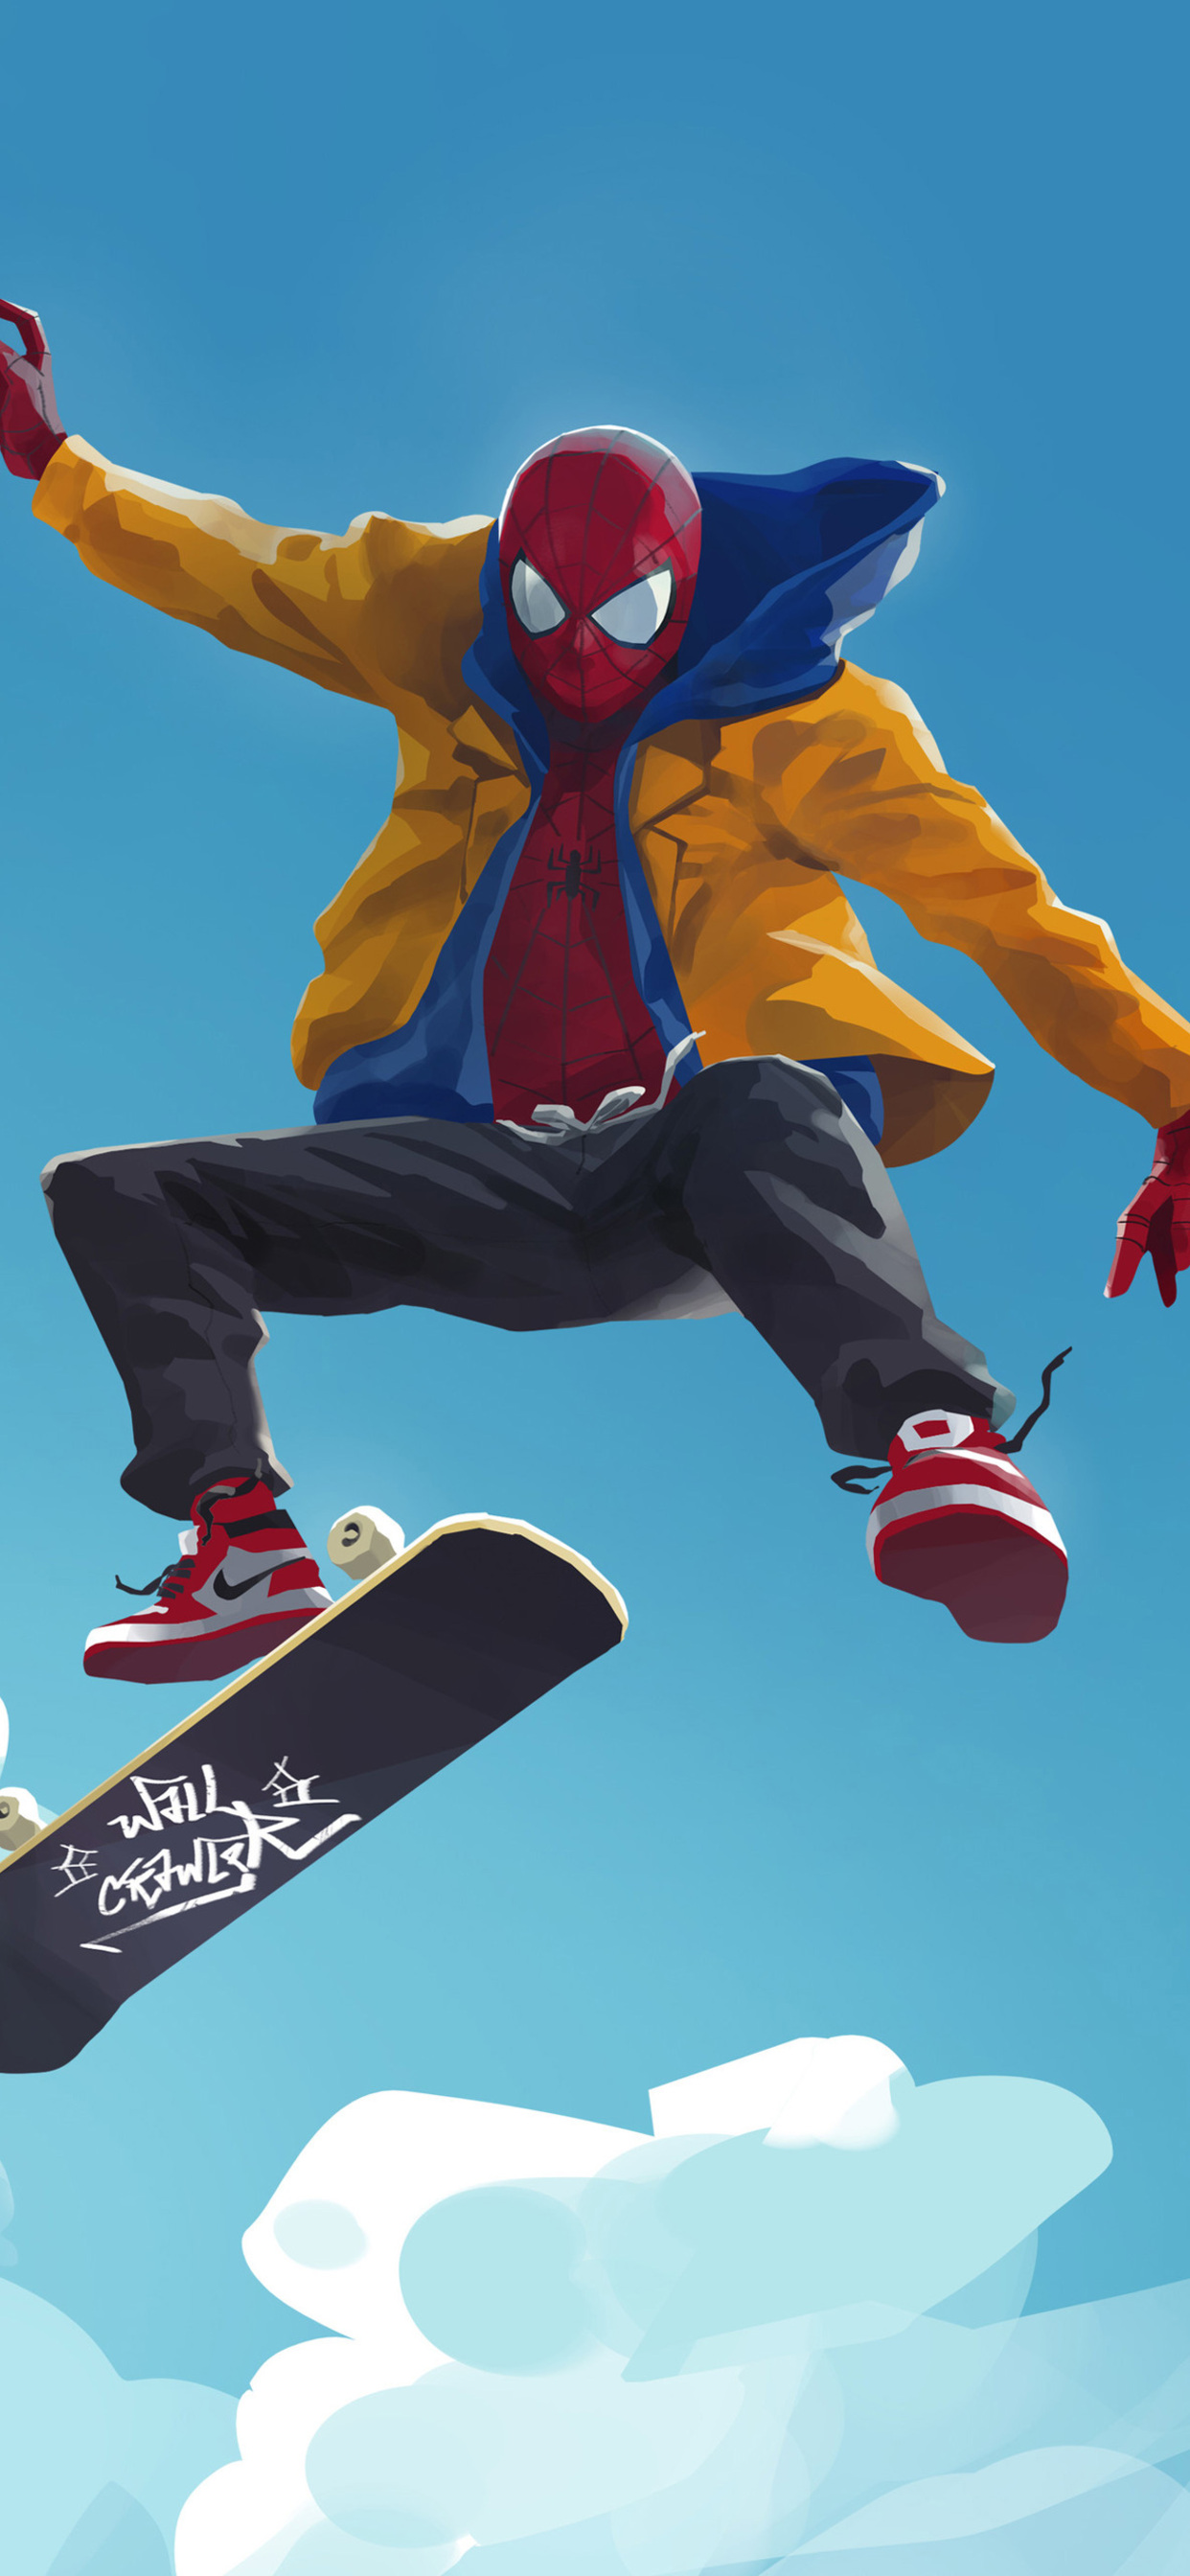 1242x2688 Spiderman Into The Spider Verse Digital Artwork Iphone Xs